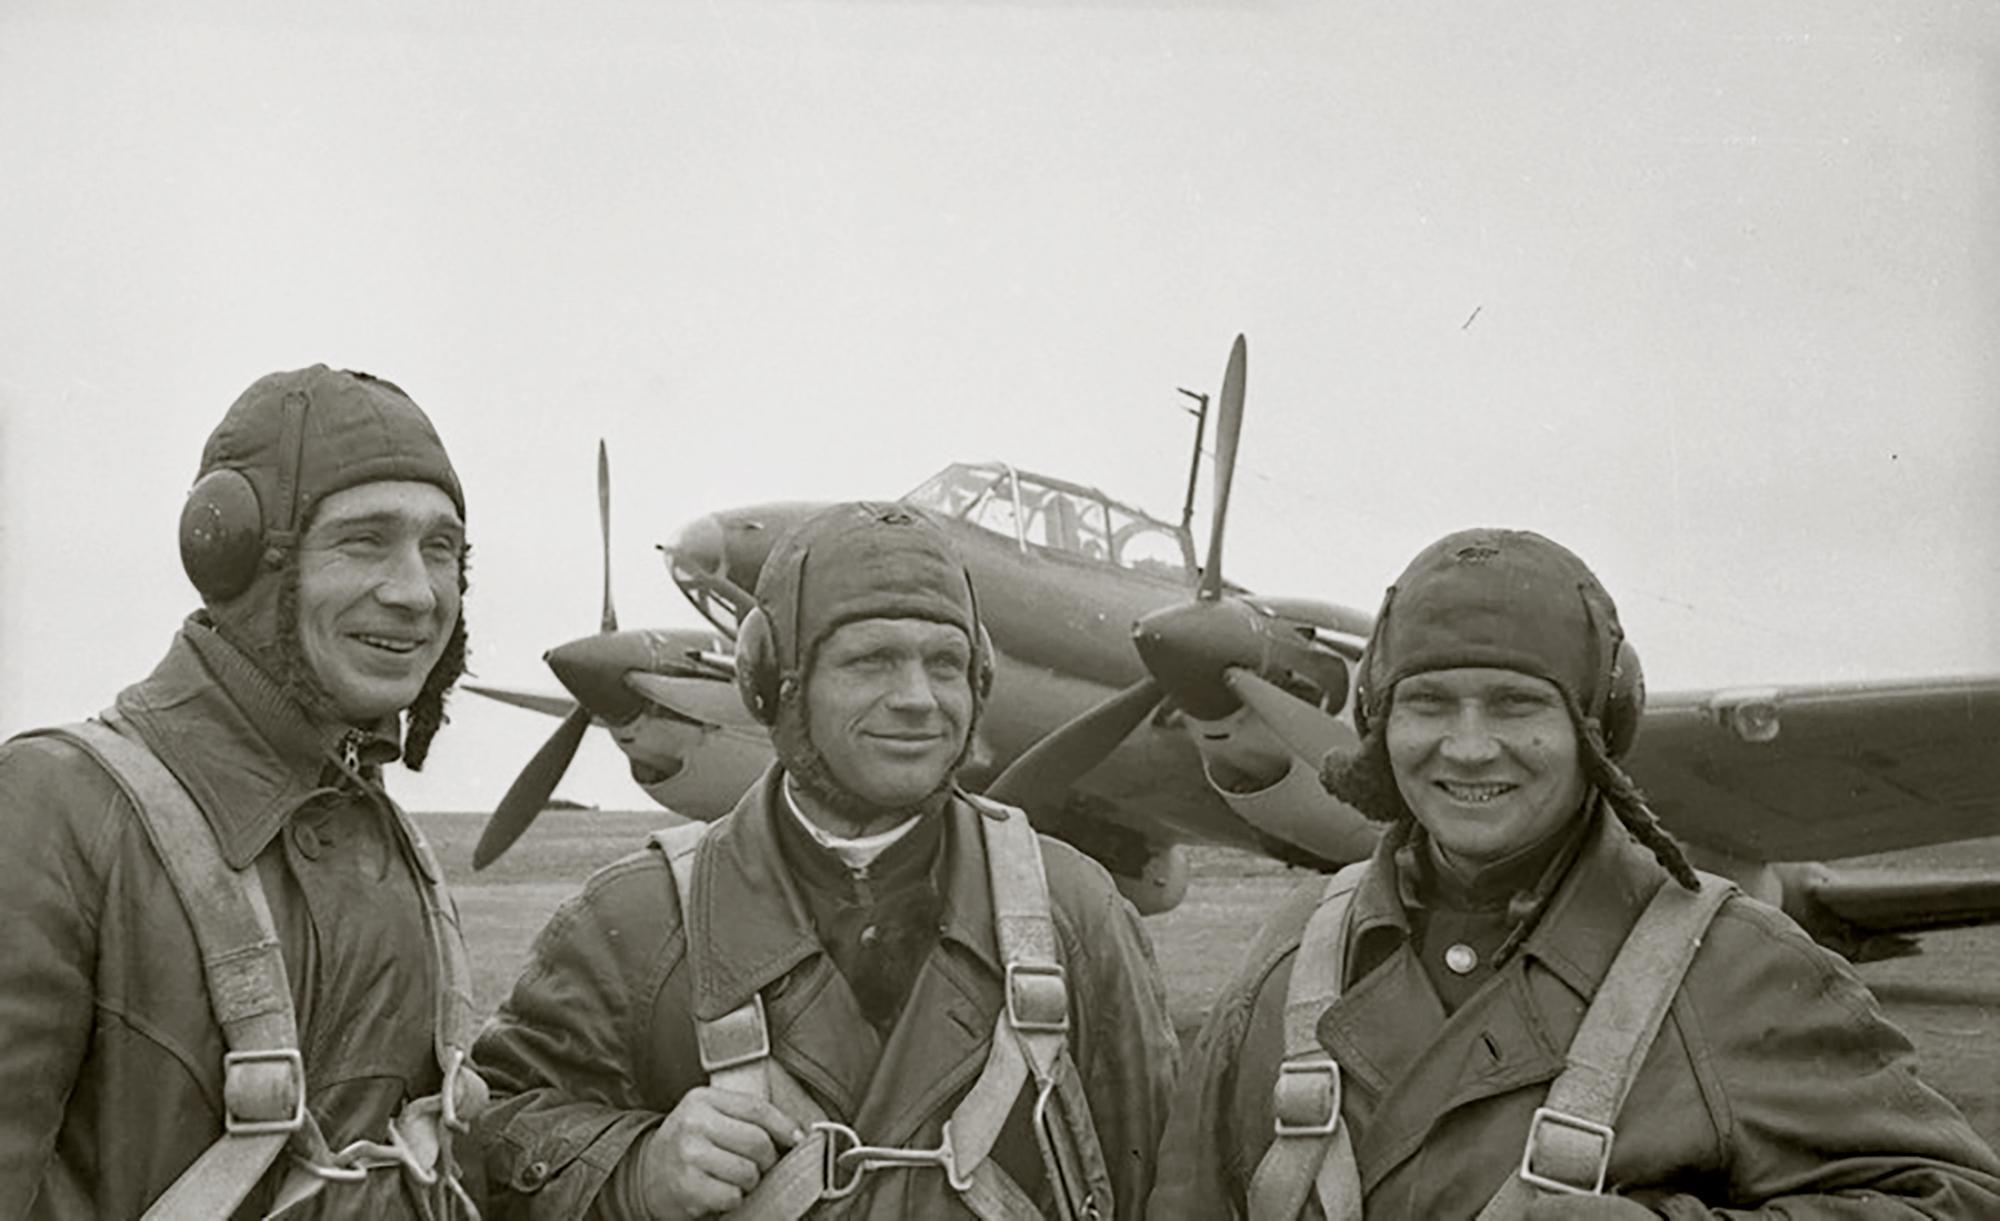 Aircrew Soviet 40GvBAP AA Nikolaev pilot,FI Shapovalov nav,VP Kopnichev radio 01